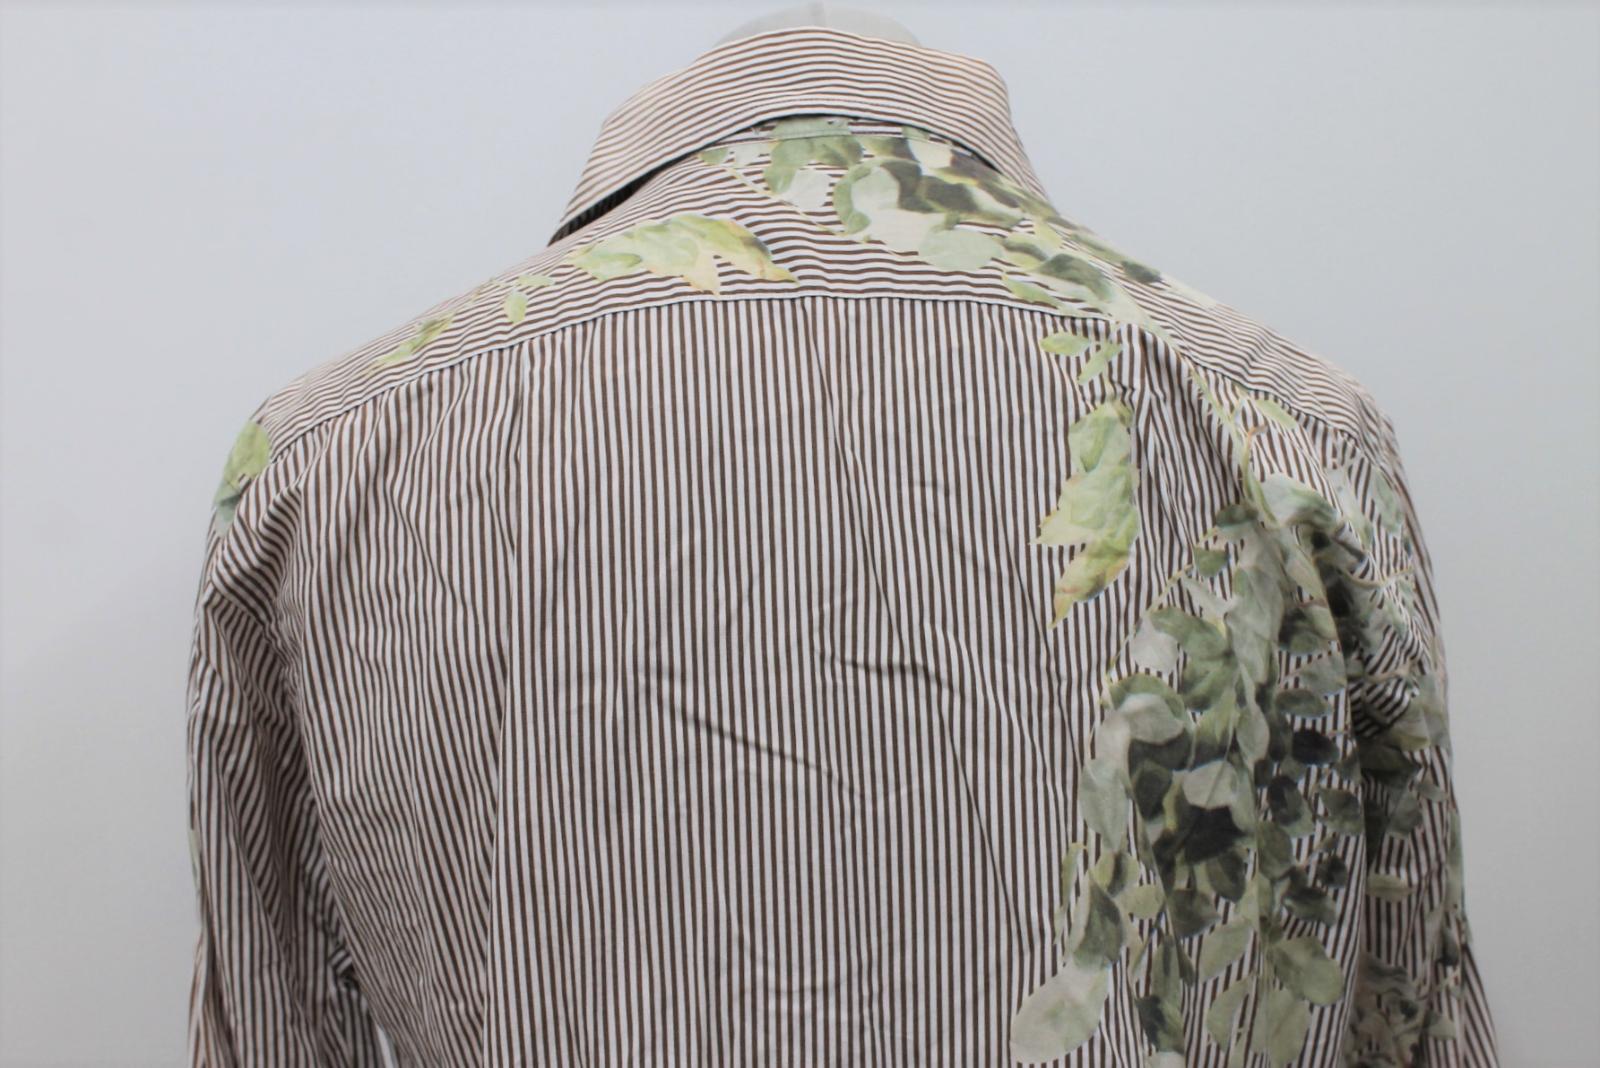 Paul-Smith-Para-Hombre-Marron-Verde-A-Rayas-Manga-Larga-de-impresion-de-hojas-Algodon-Camisa-Tamano miniatura 5